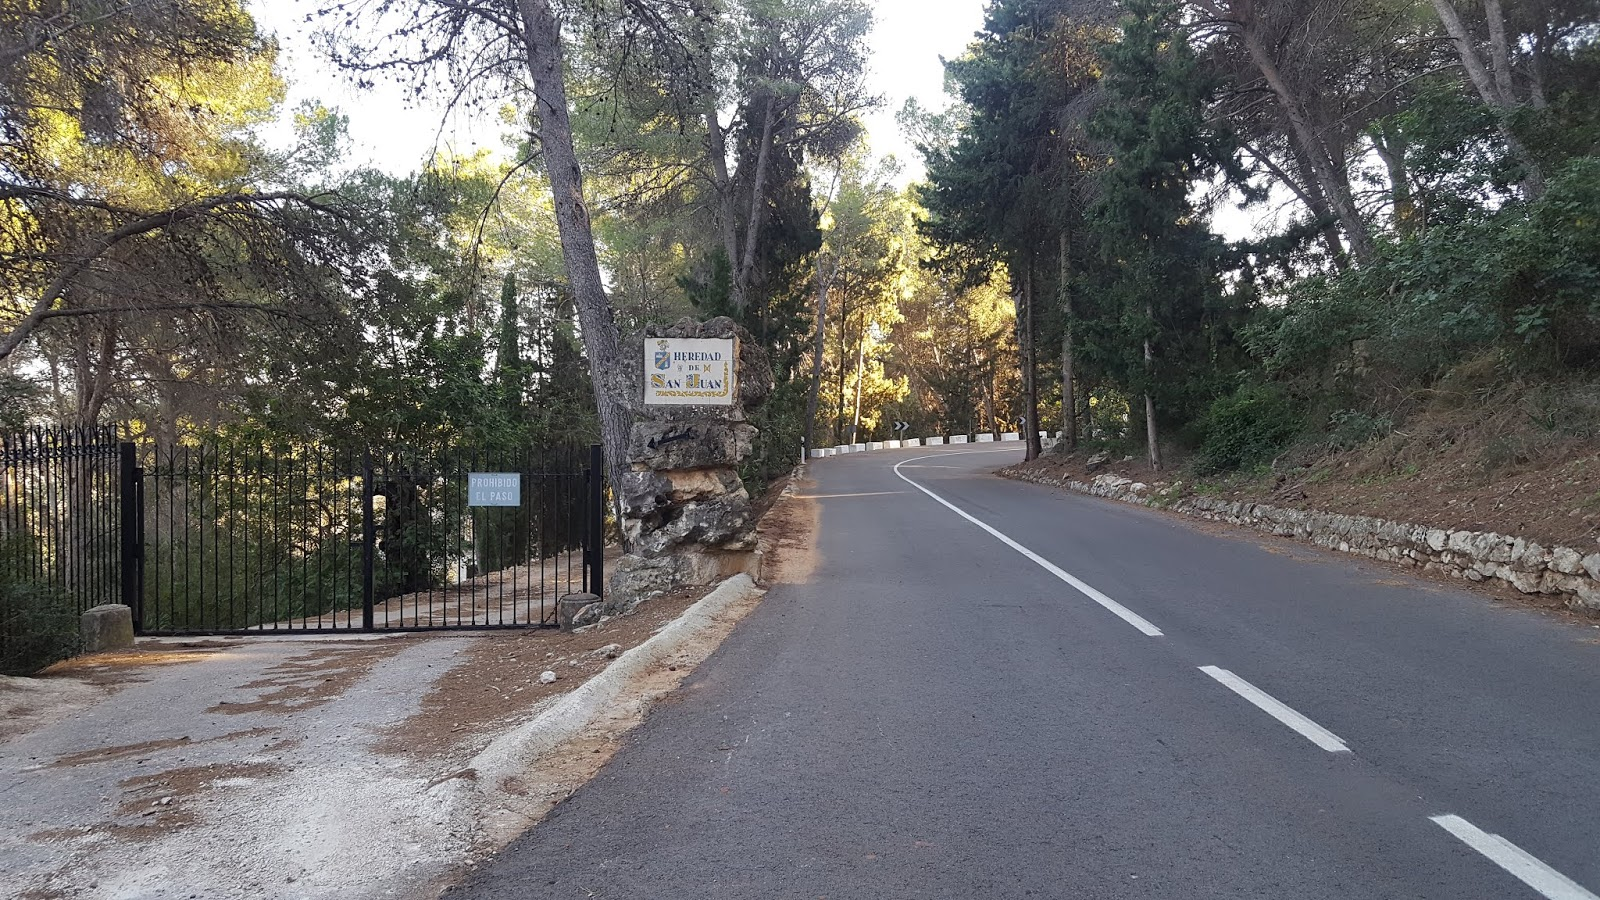 Heredad de San Juan, Vall de Ebo, Alicante